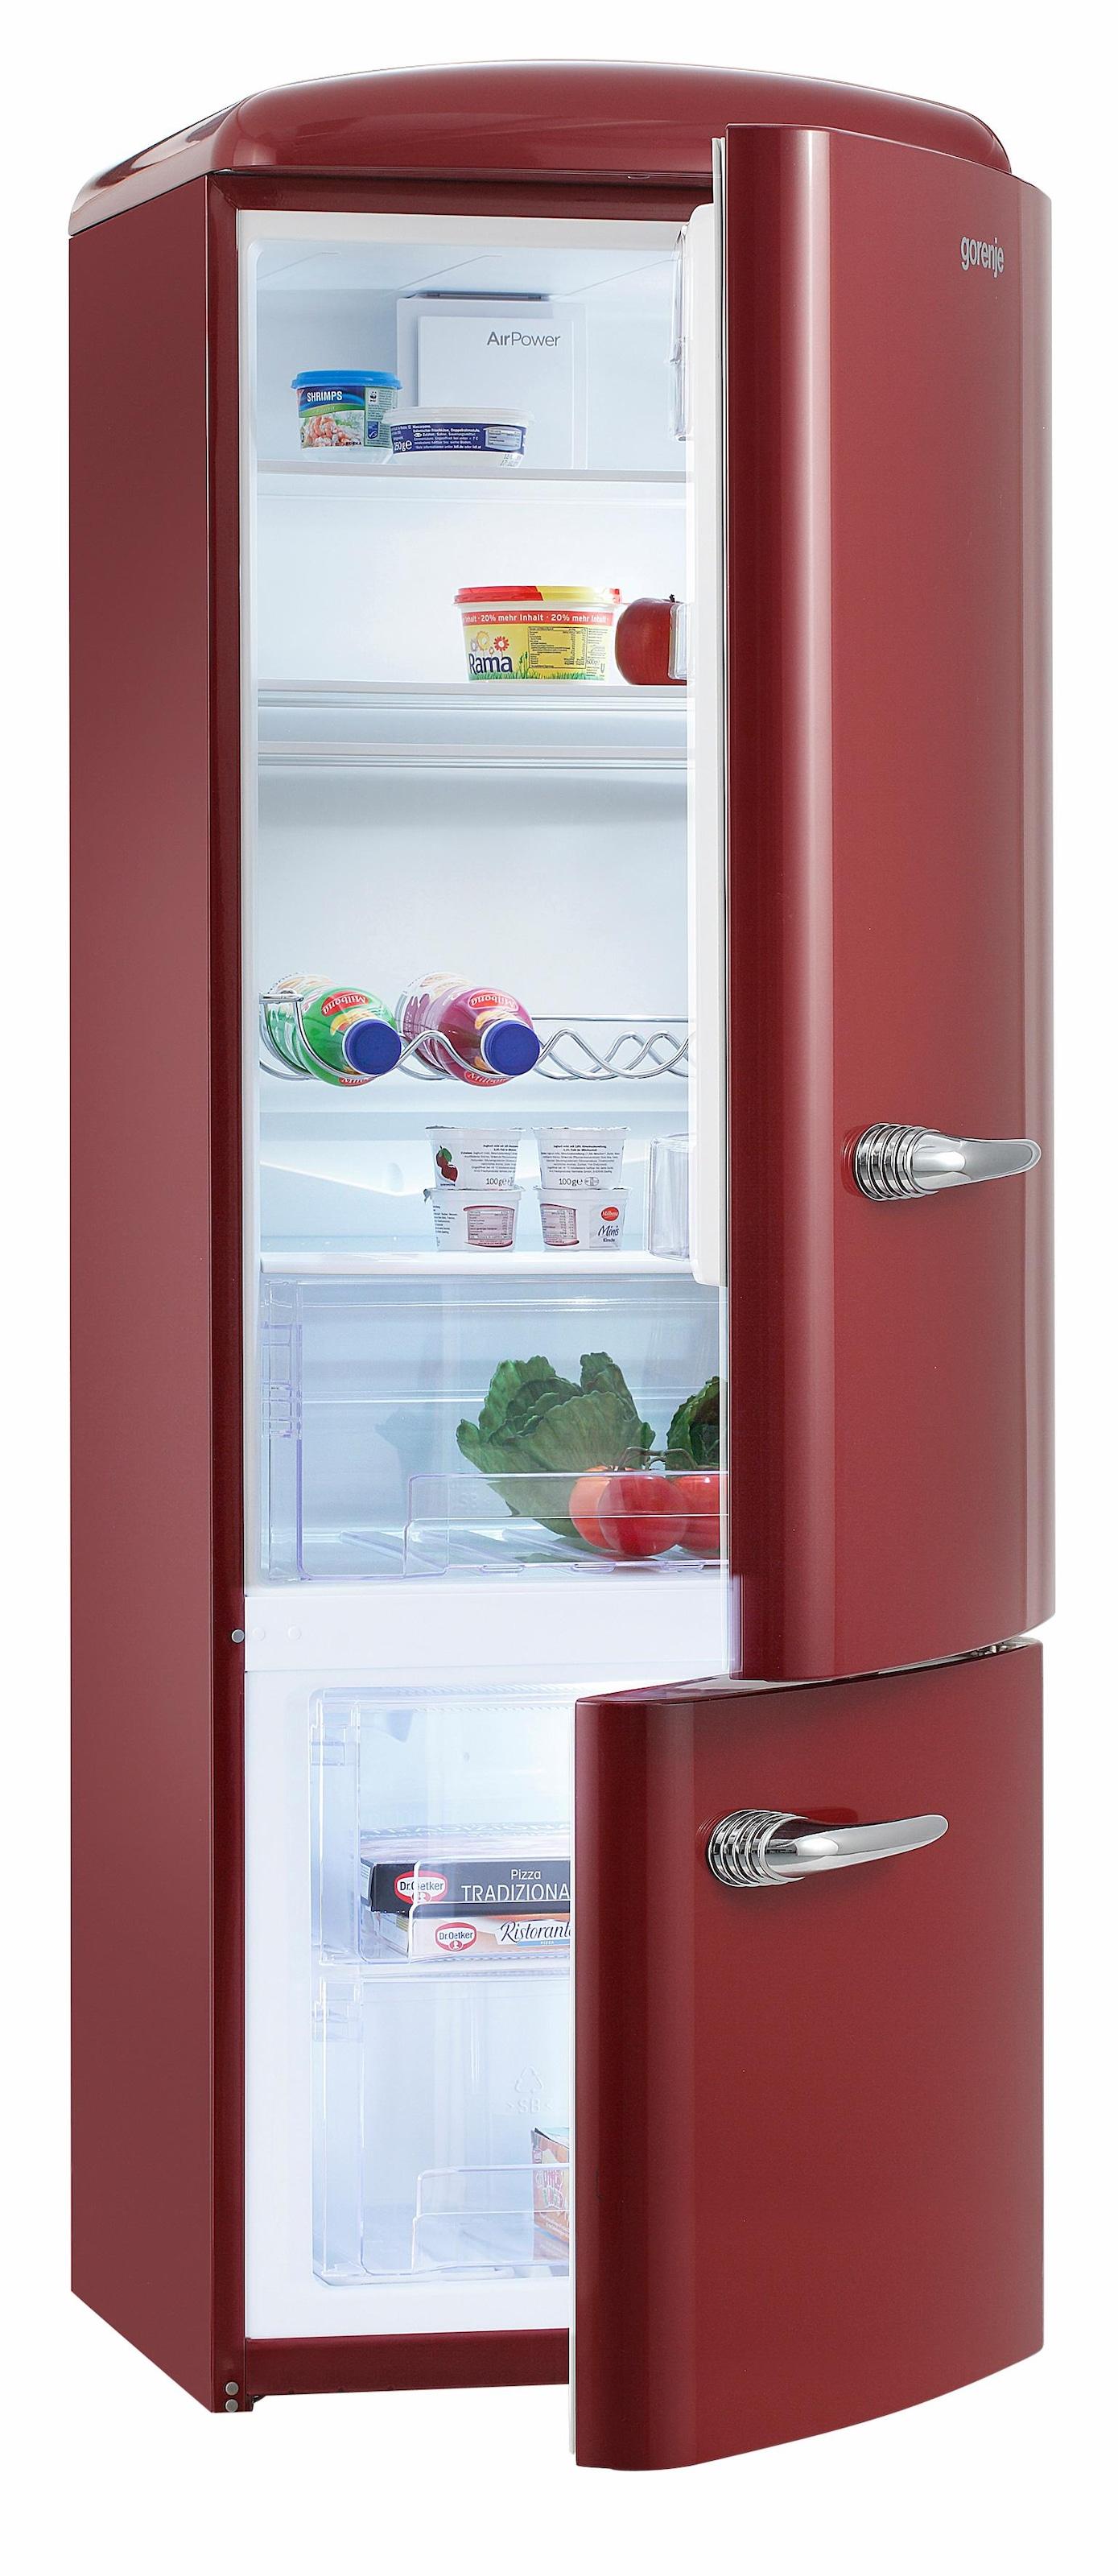 Kühlschrank Nostalgie : Antiker kühlschrank eisschrank um schrank closet küche etsy